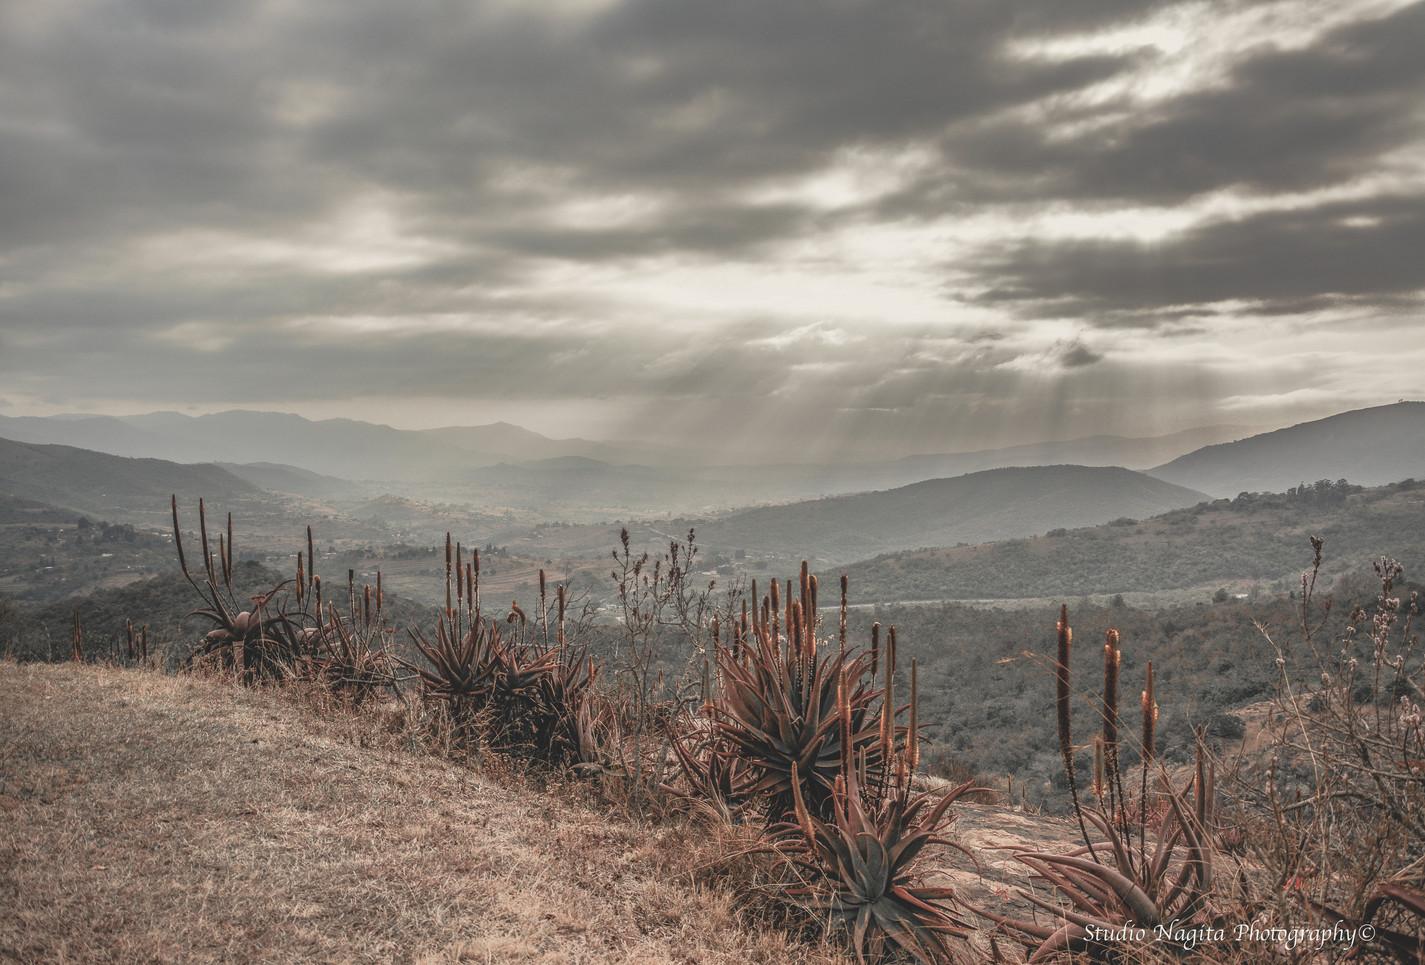 Swaziland Aloe Landscape